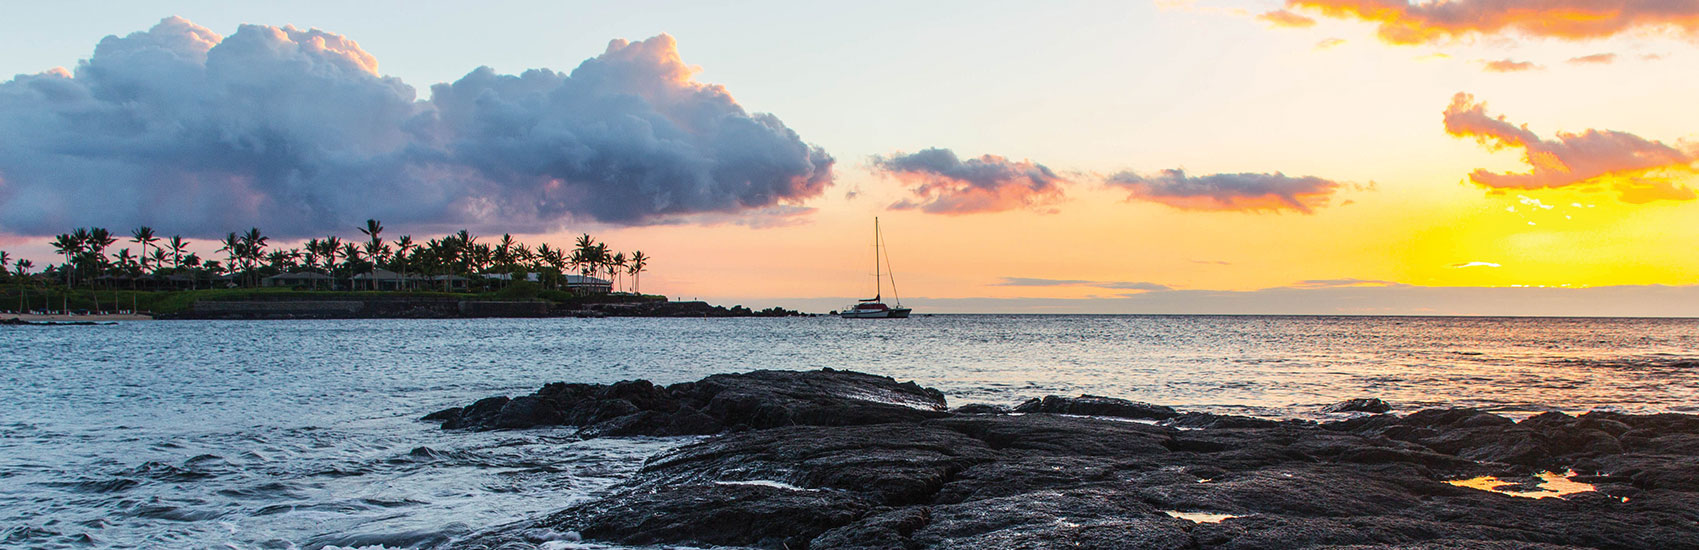 Save On Hawaii With Pleasant Holidays 1